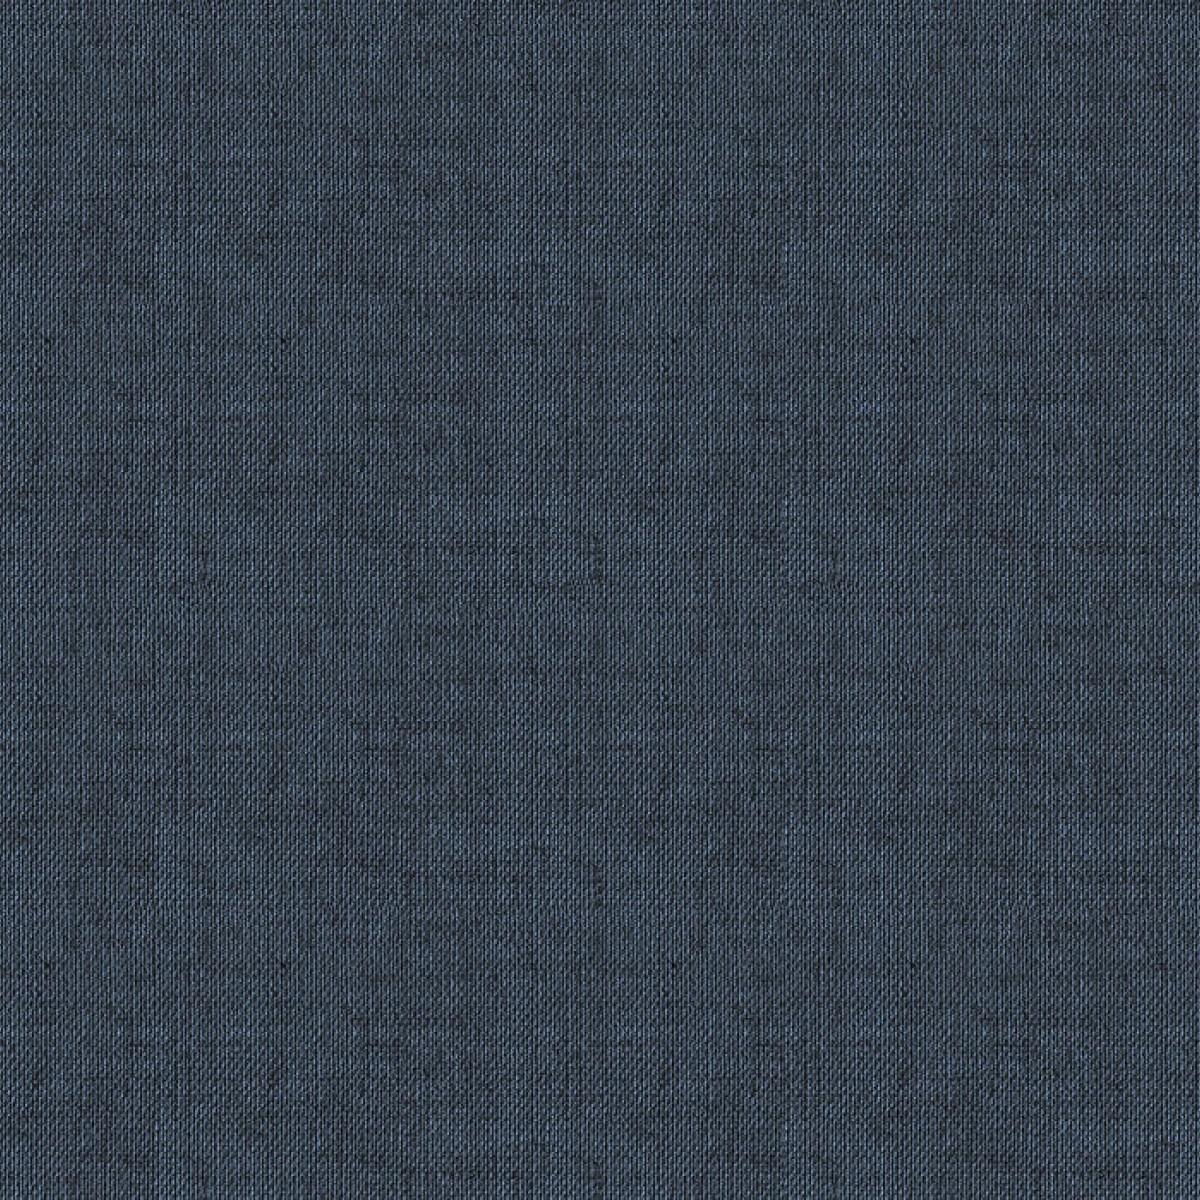 Fototapet Linen Blue, personalizat, Photowall